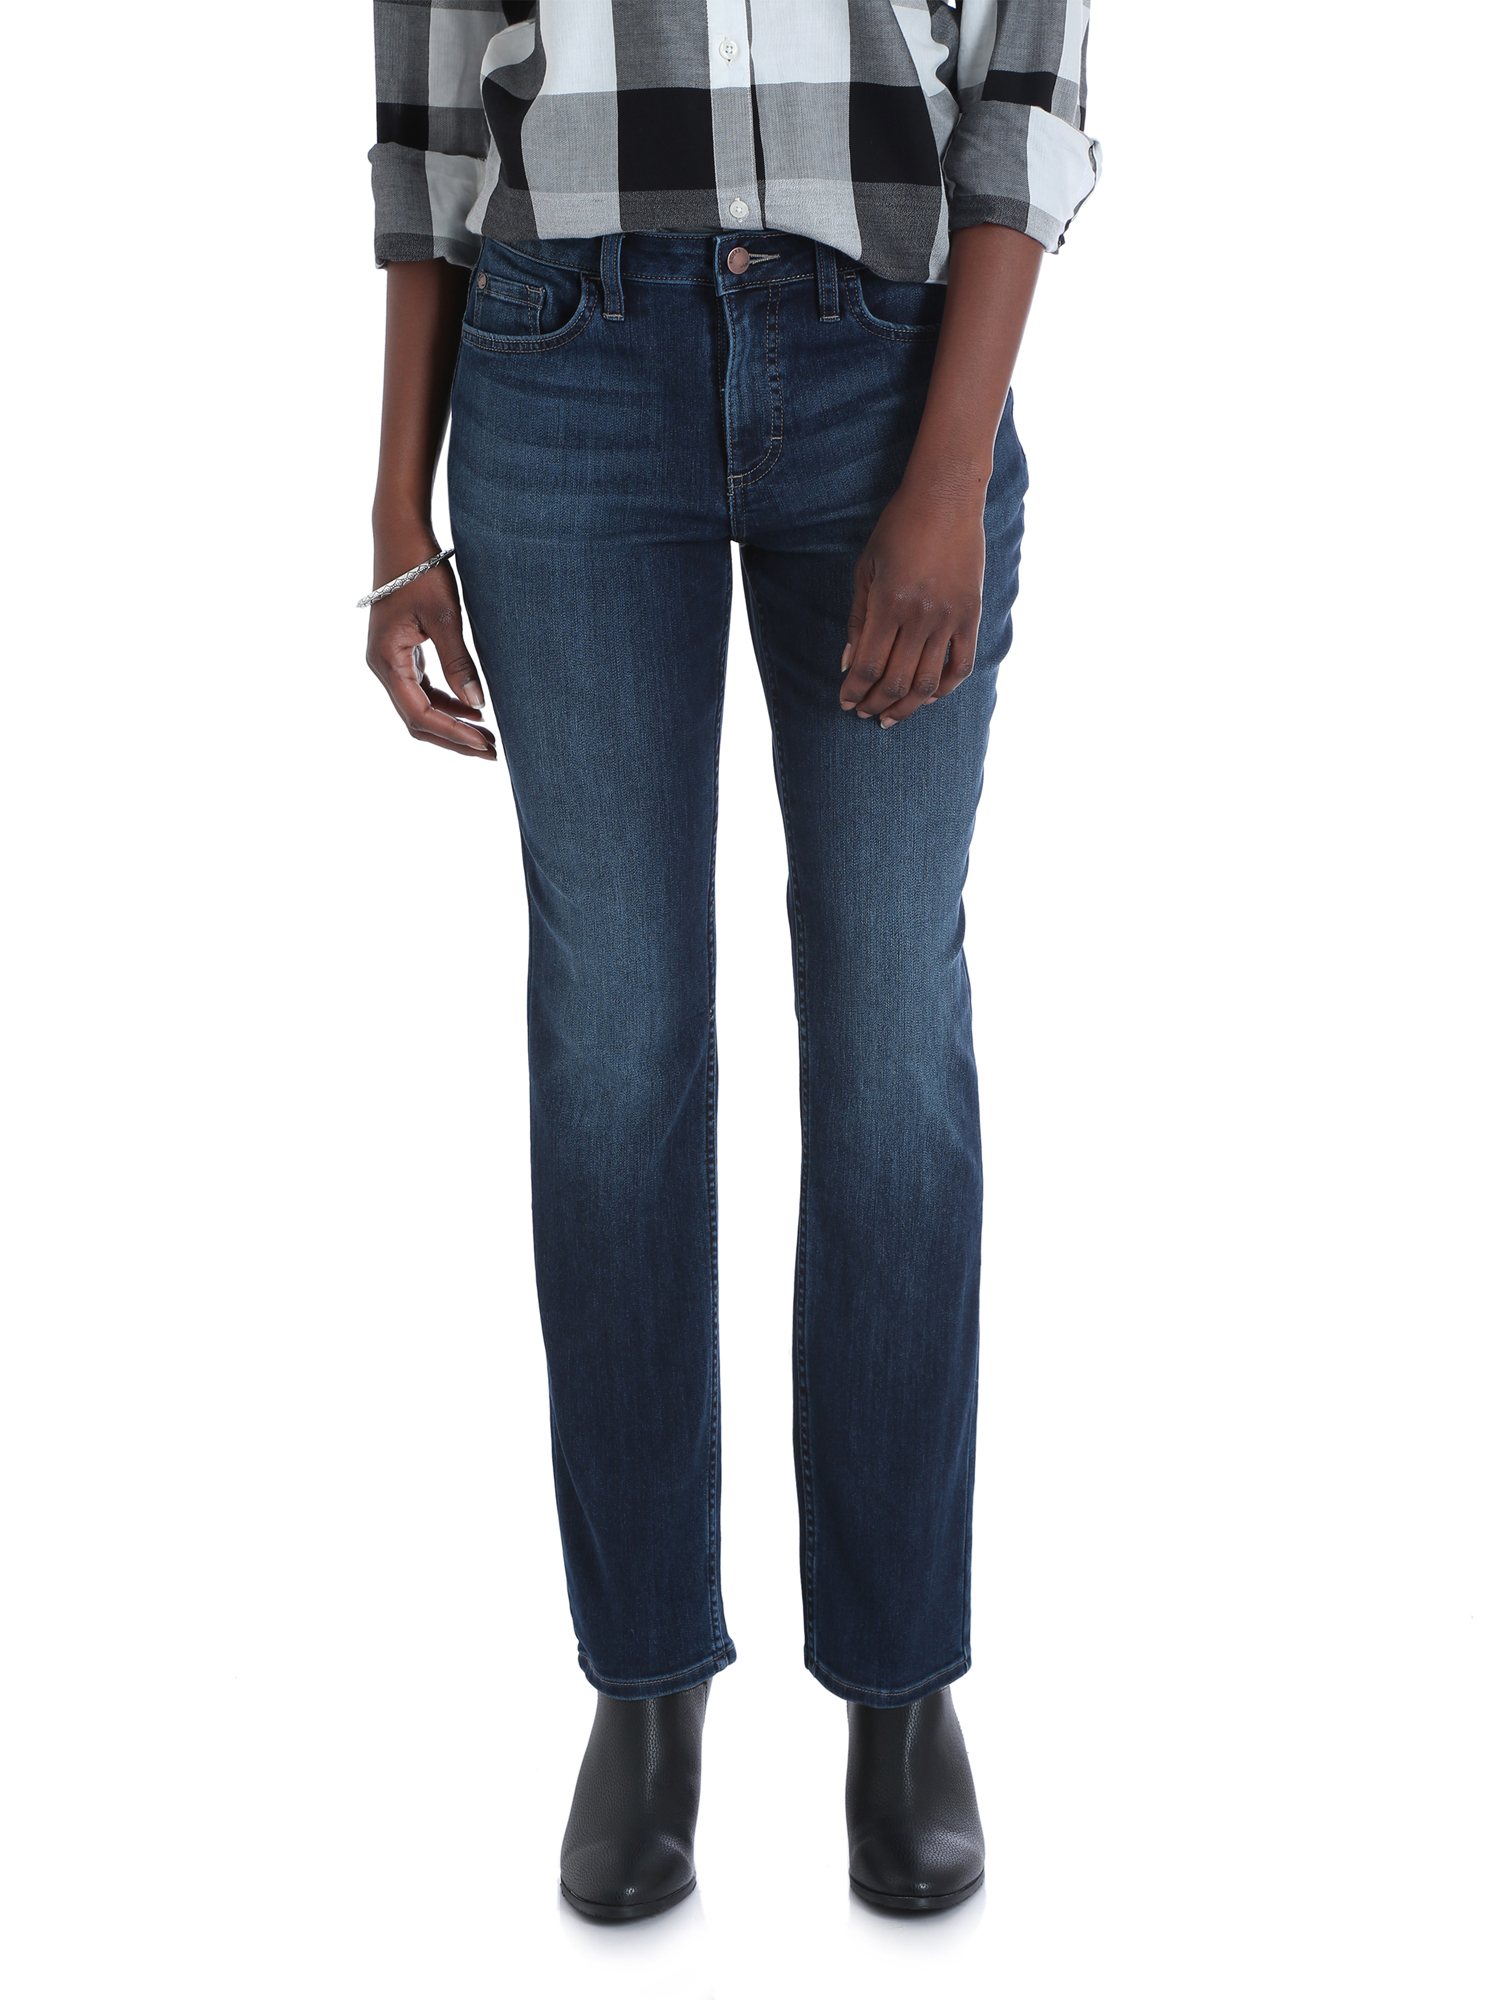 Women's Midrise Straight Jean